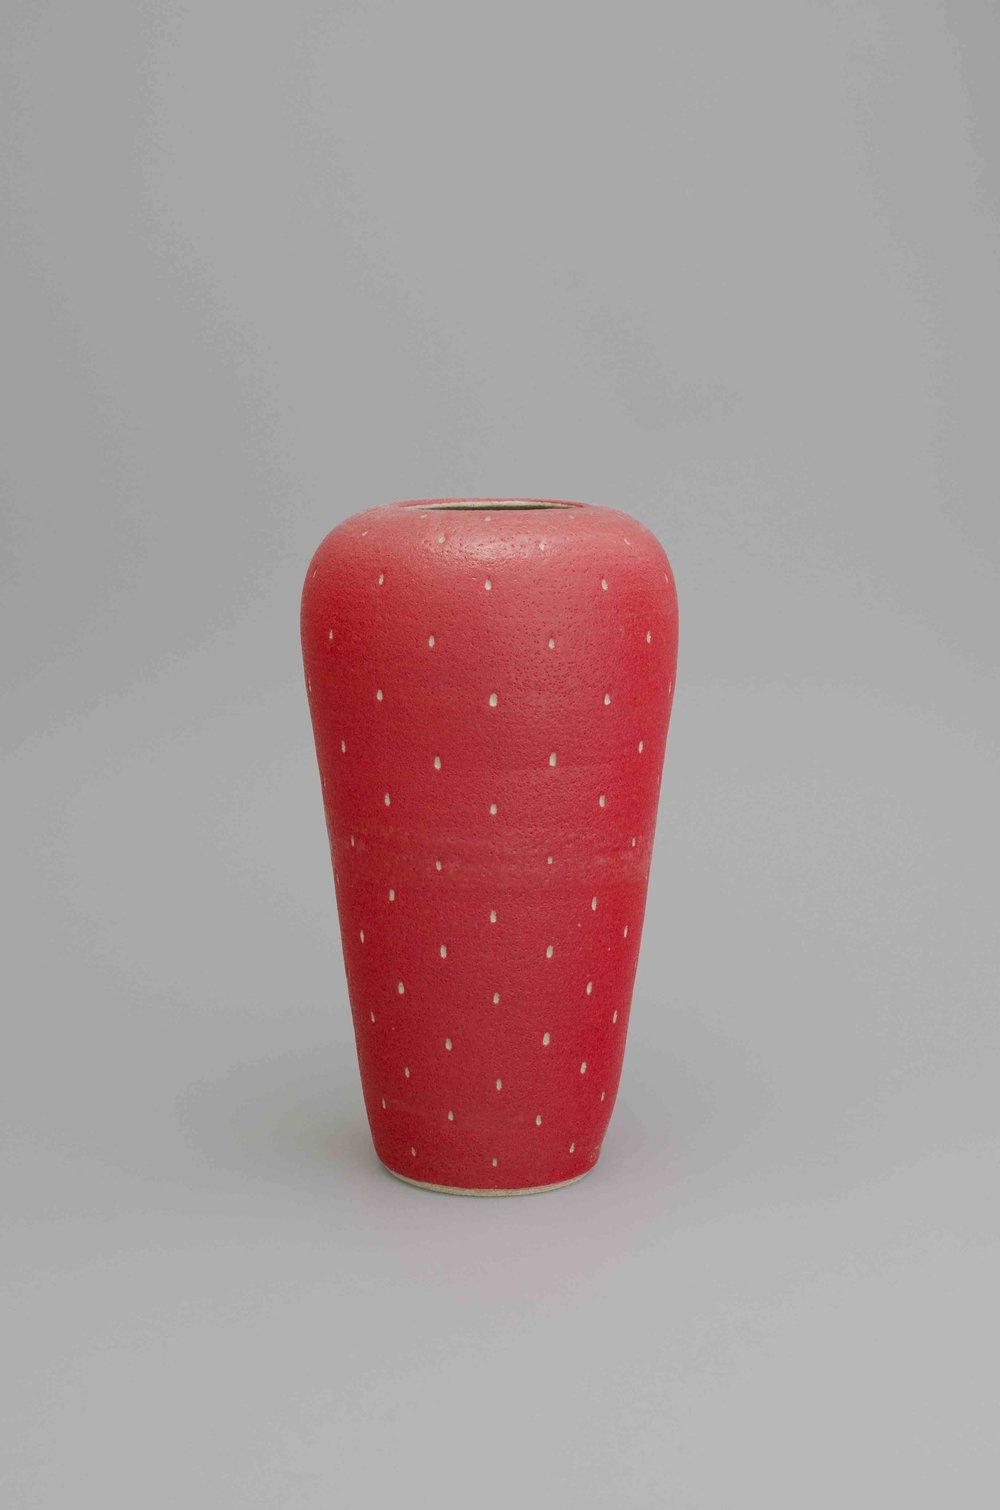 Shio Kusaka Untitled (strawberry 39) 2015 Stoneware 18.5 x 10 x 10 in (46.99h x 25.4w x 25.4d cm) SK436